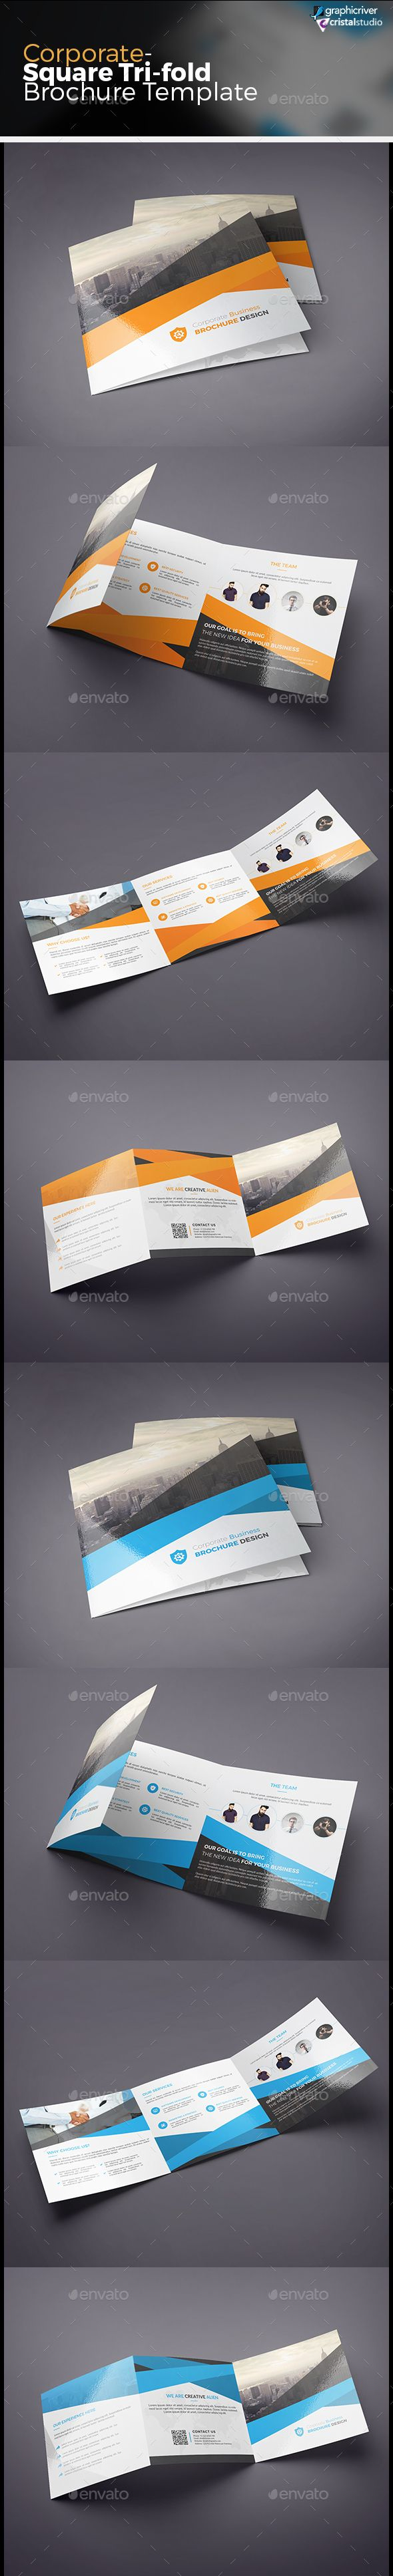 Square Tri-fold Brochure Template #design Download: http://graphicriver.net/item/square-trifold-brochure/13583686?ref=ksioks